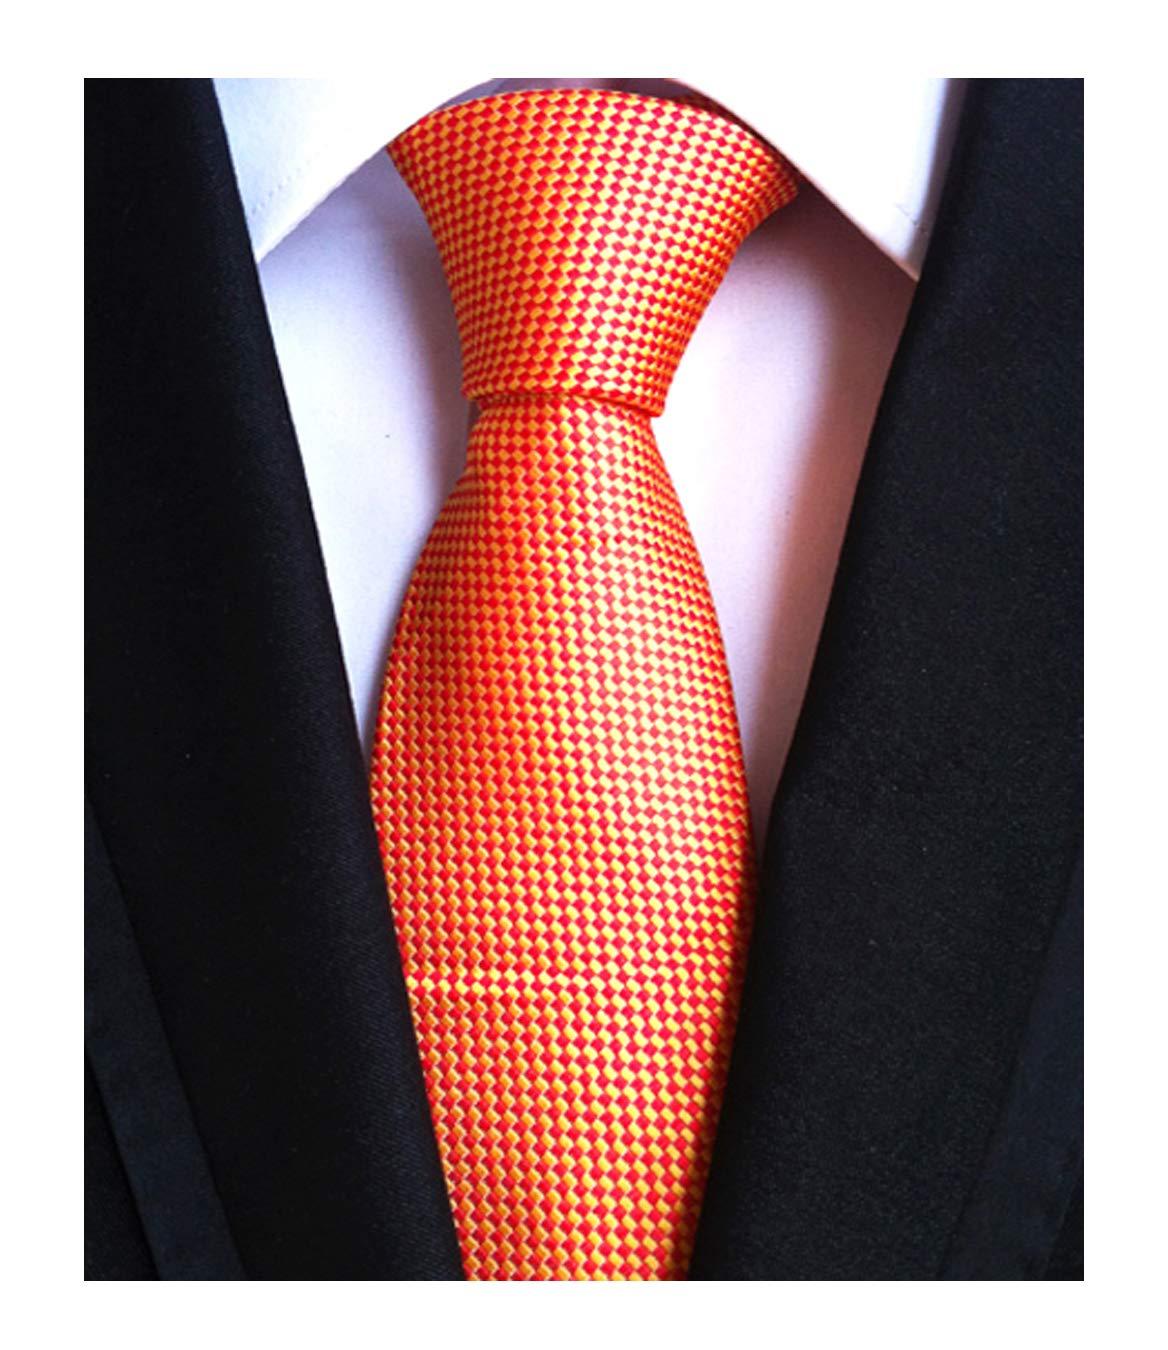 Yellow Orange Silk Ties Auttmn Formal Dress Necktie Decent Holiday Gifts for Men